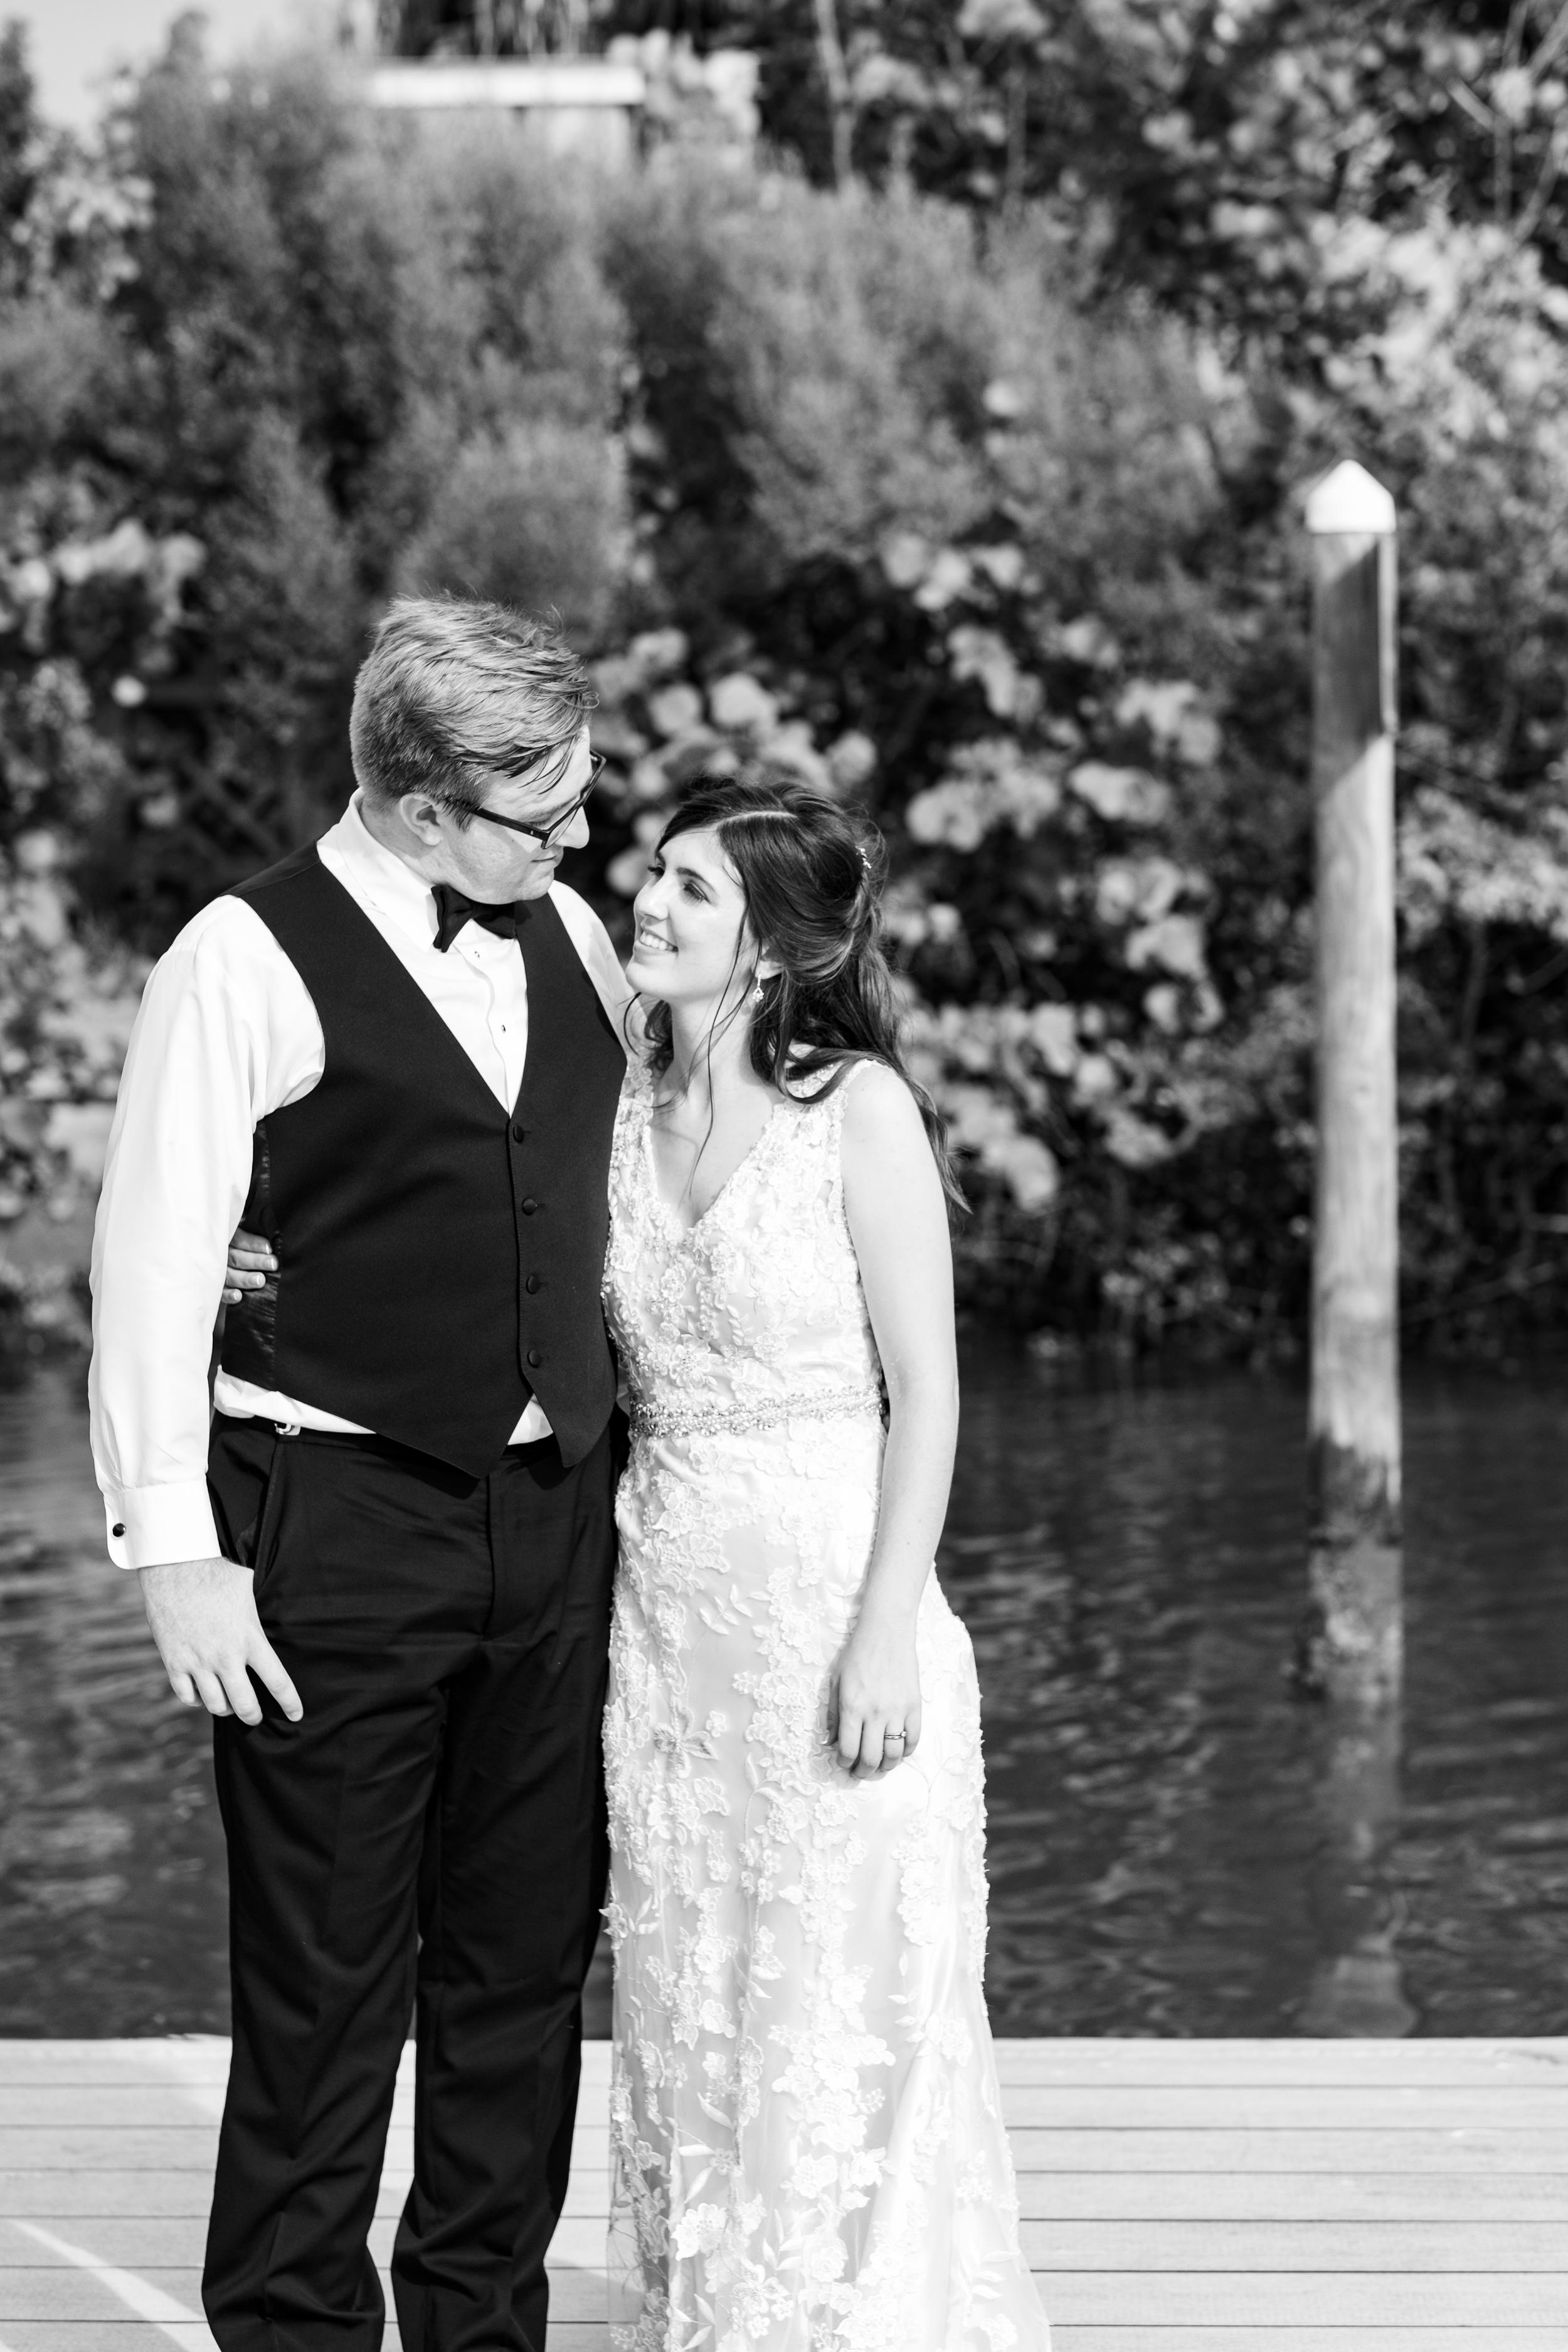 HAH_Zoe and Daniel_Clearwater Wedding_634_2018.jpg